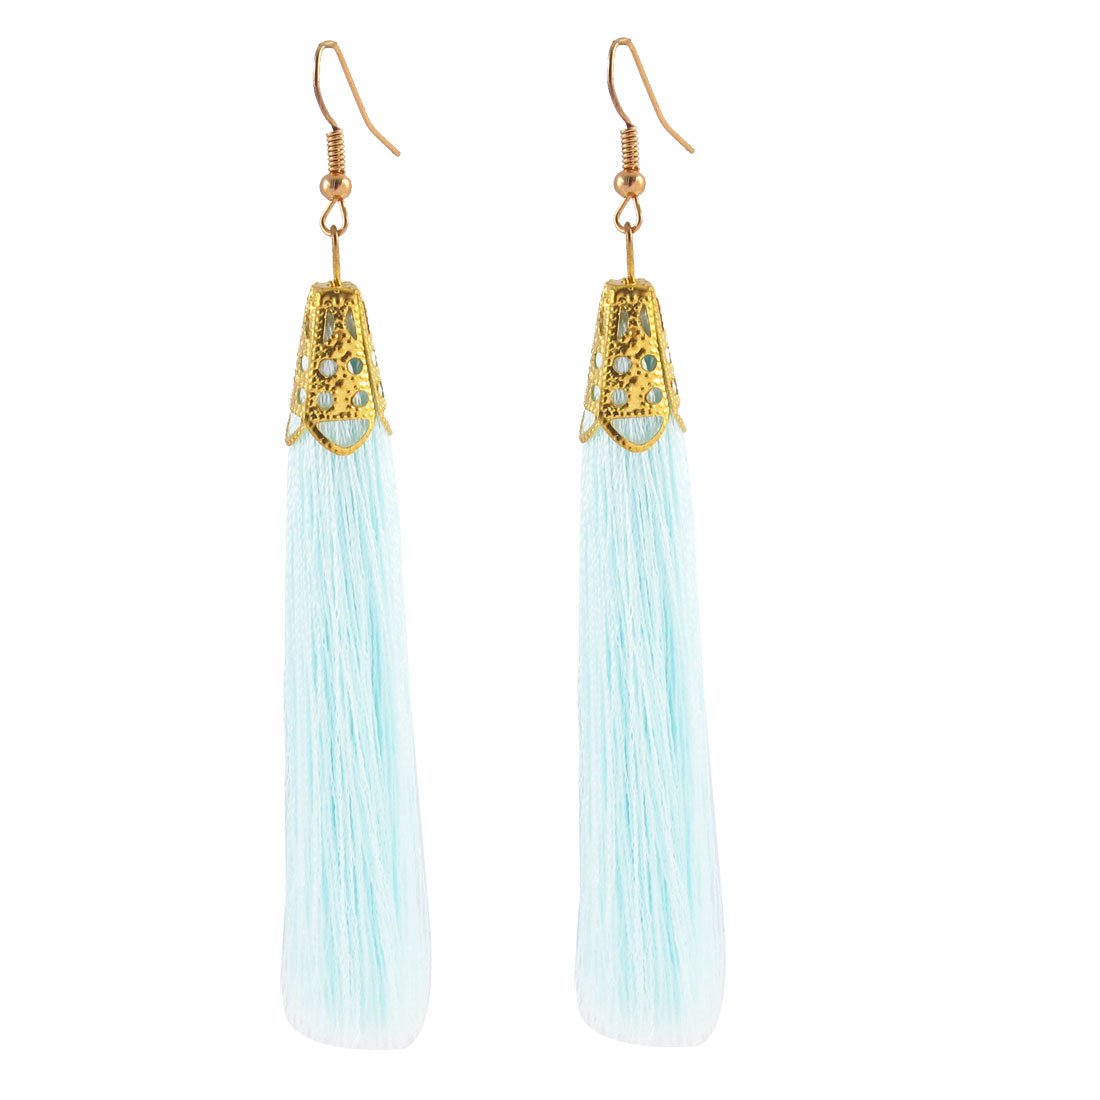 Fish Hook Long Nylon Tassel Drop Earrings Eardrop 2 Pcs Blue Gold Tone